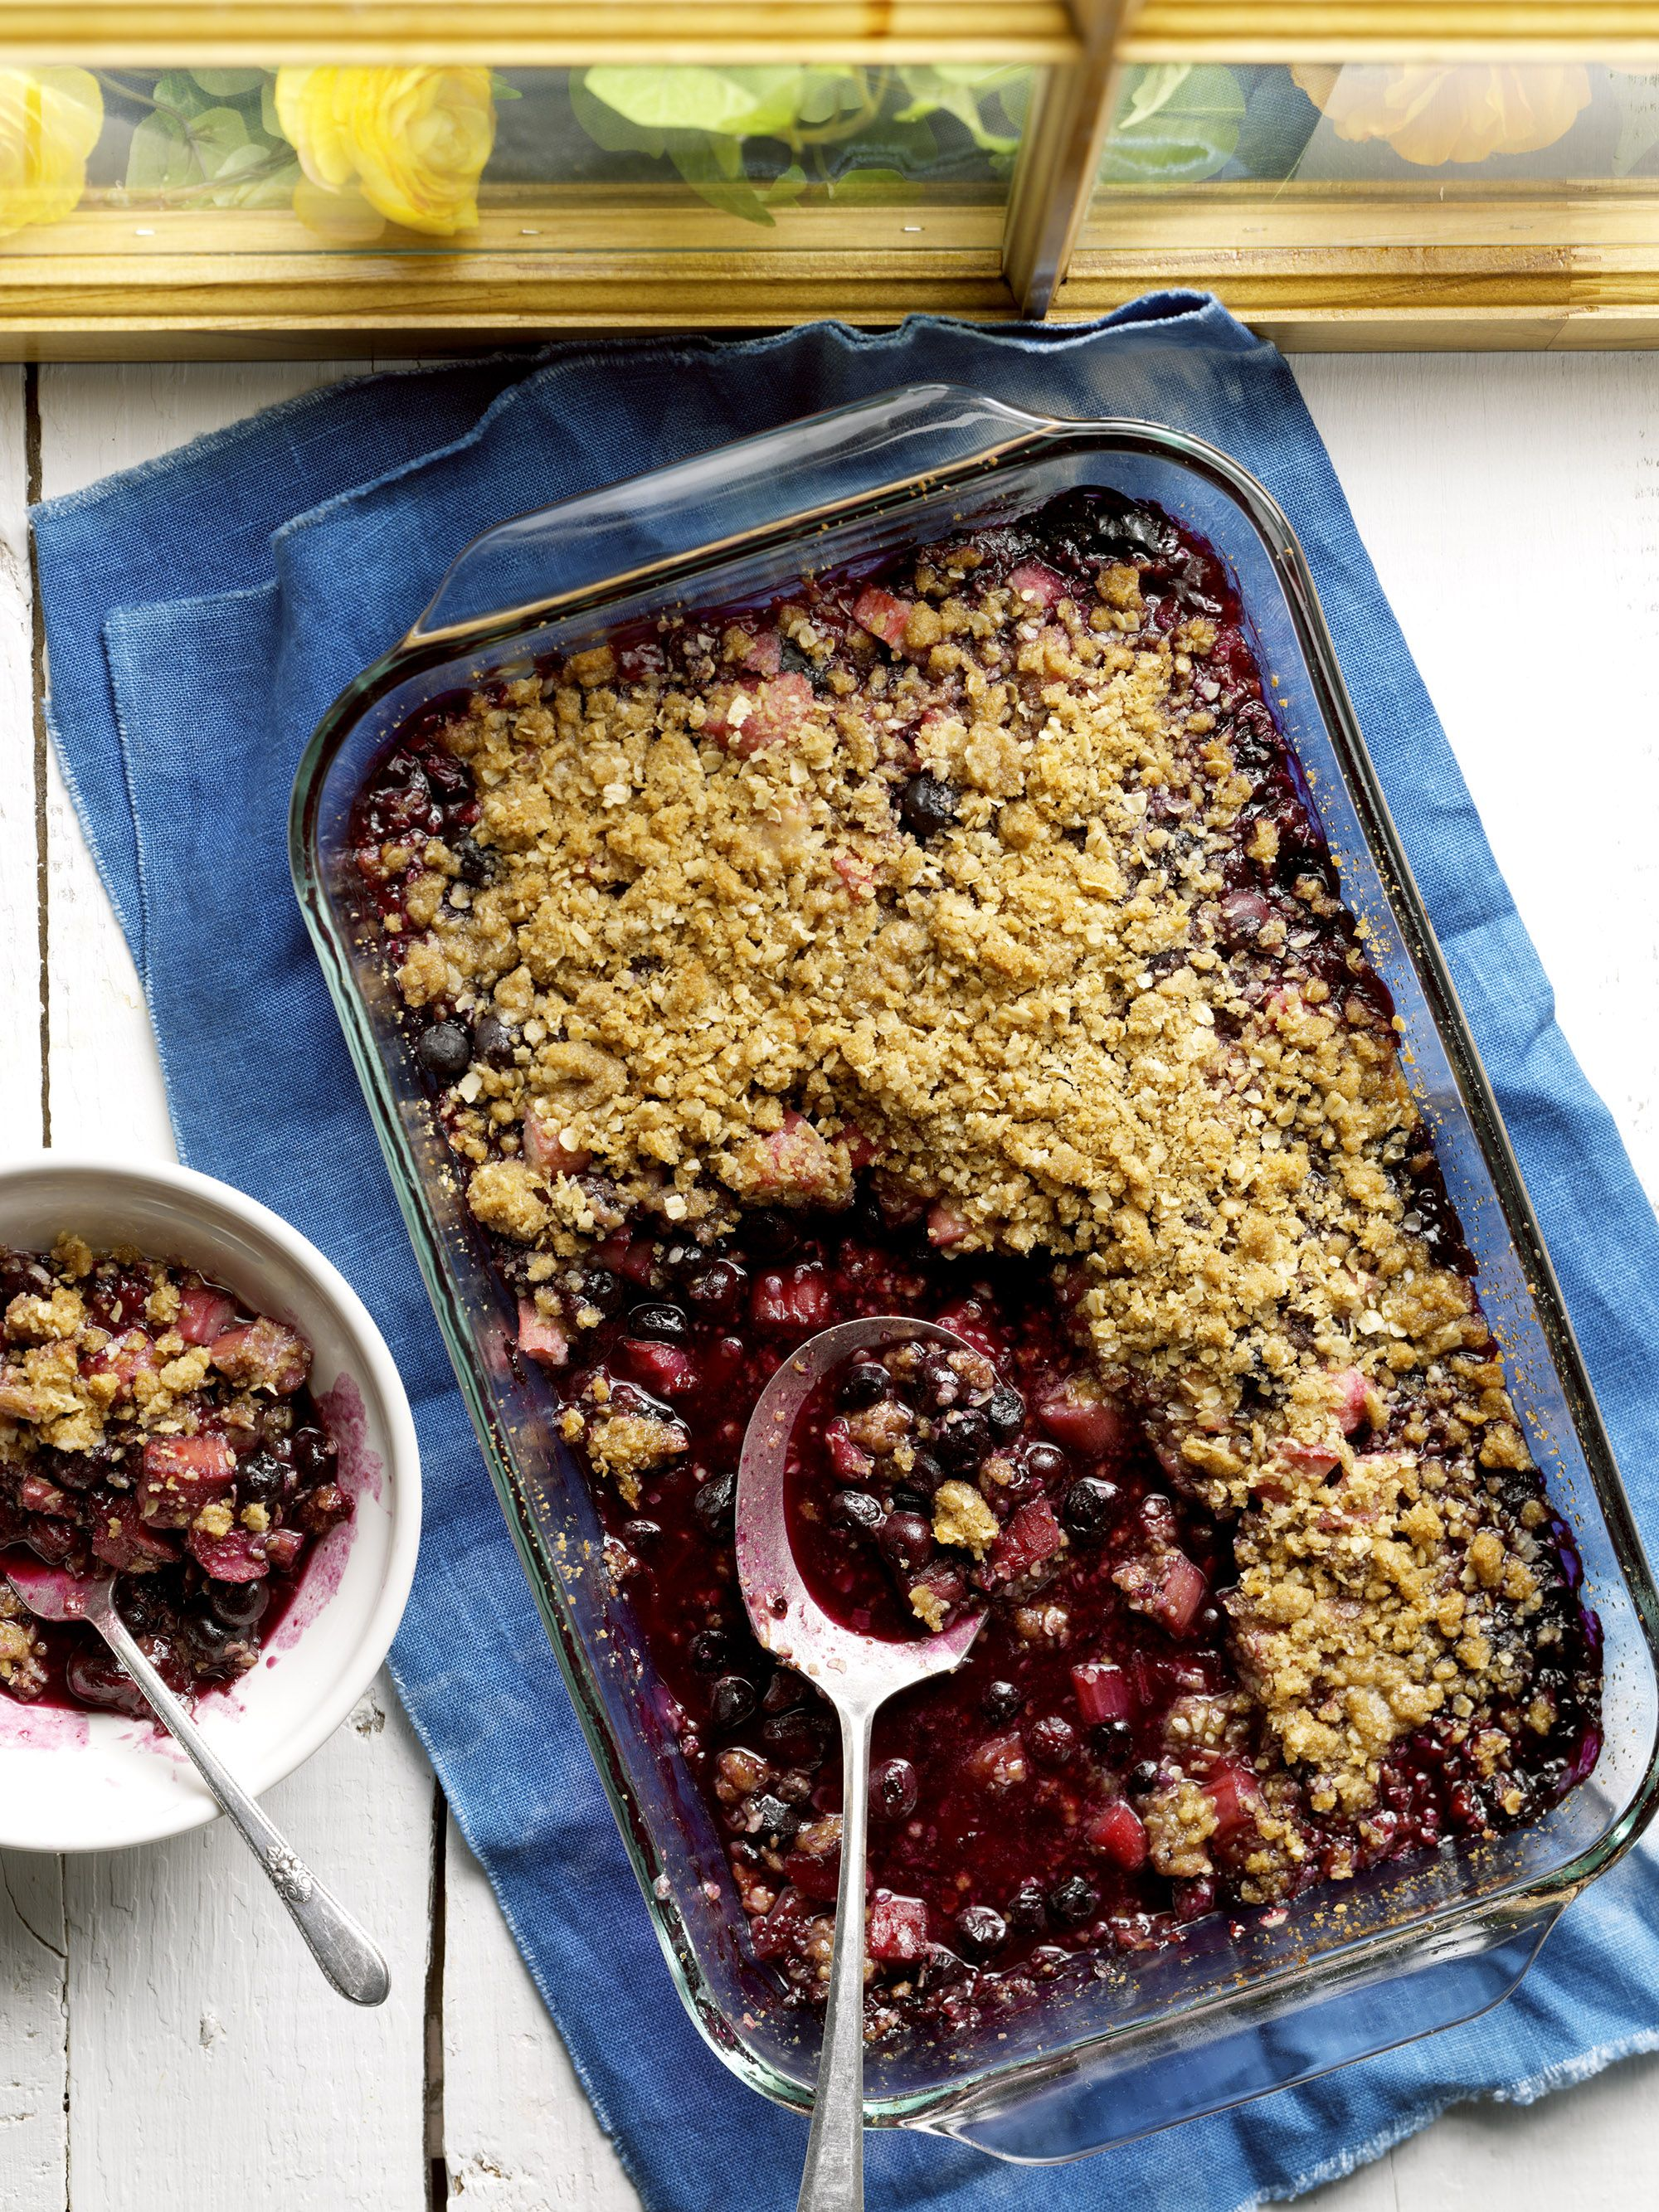 BlueberryRhubarb Crumble Recipe Blueberry rhubarb